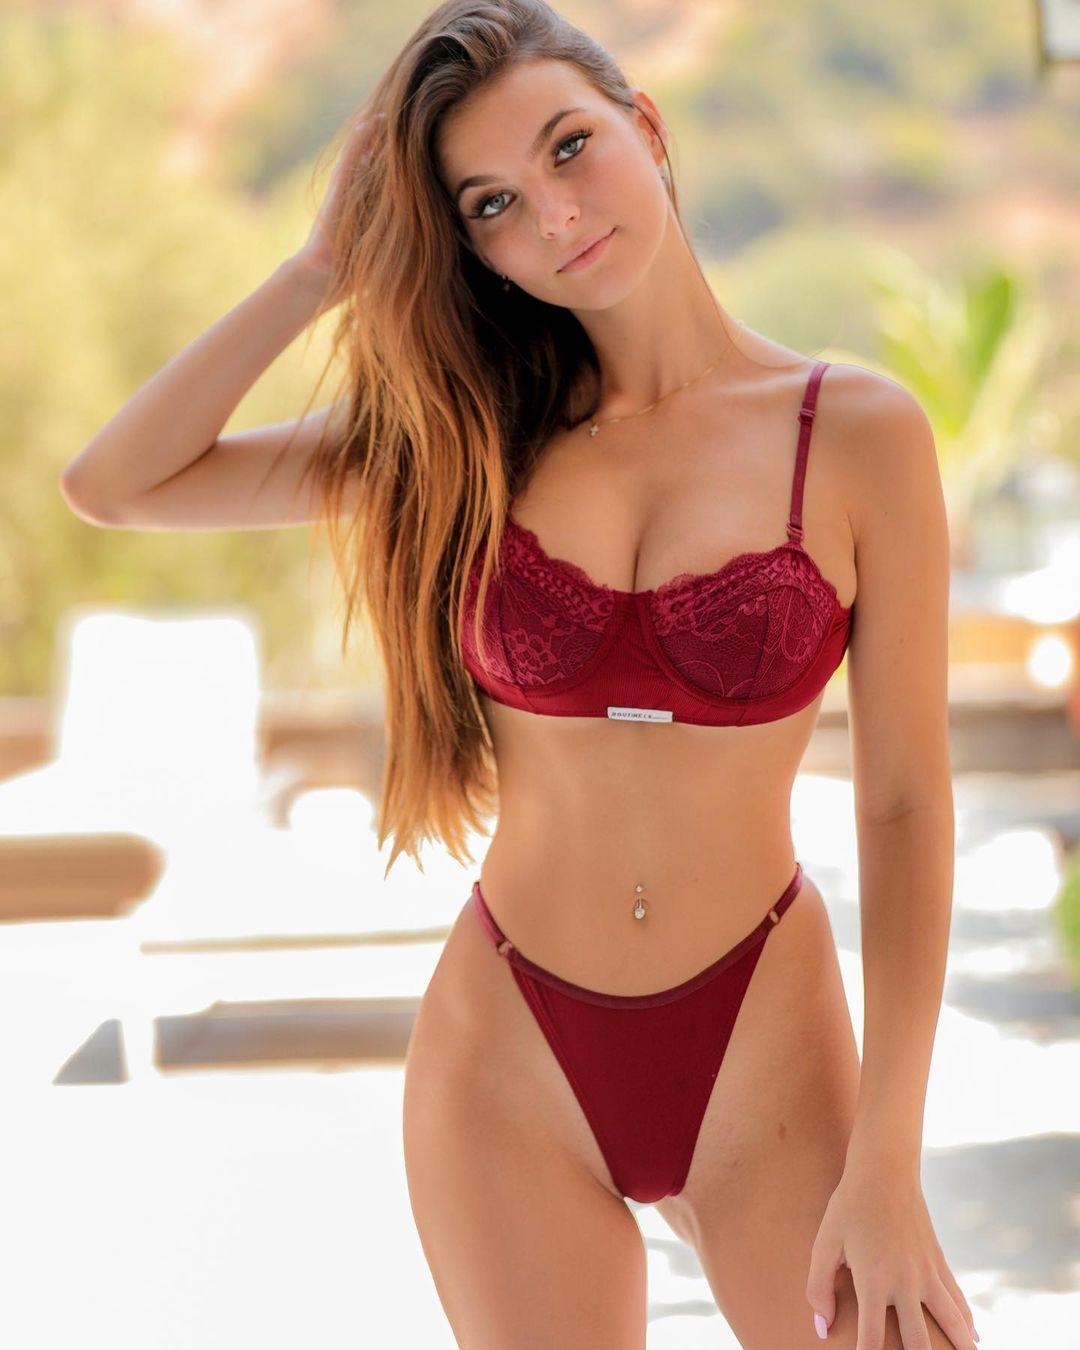 Grace Boor Nude Onlyfans Leaked 0031